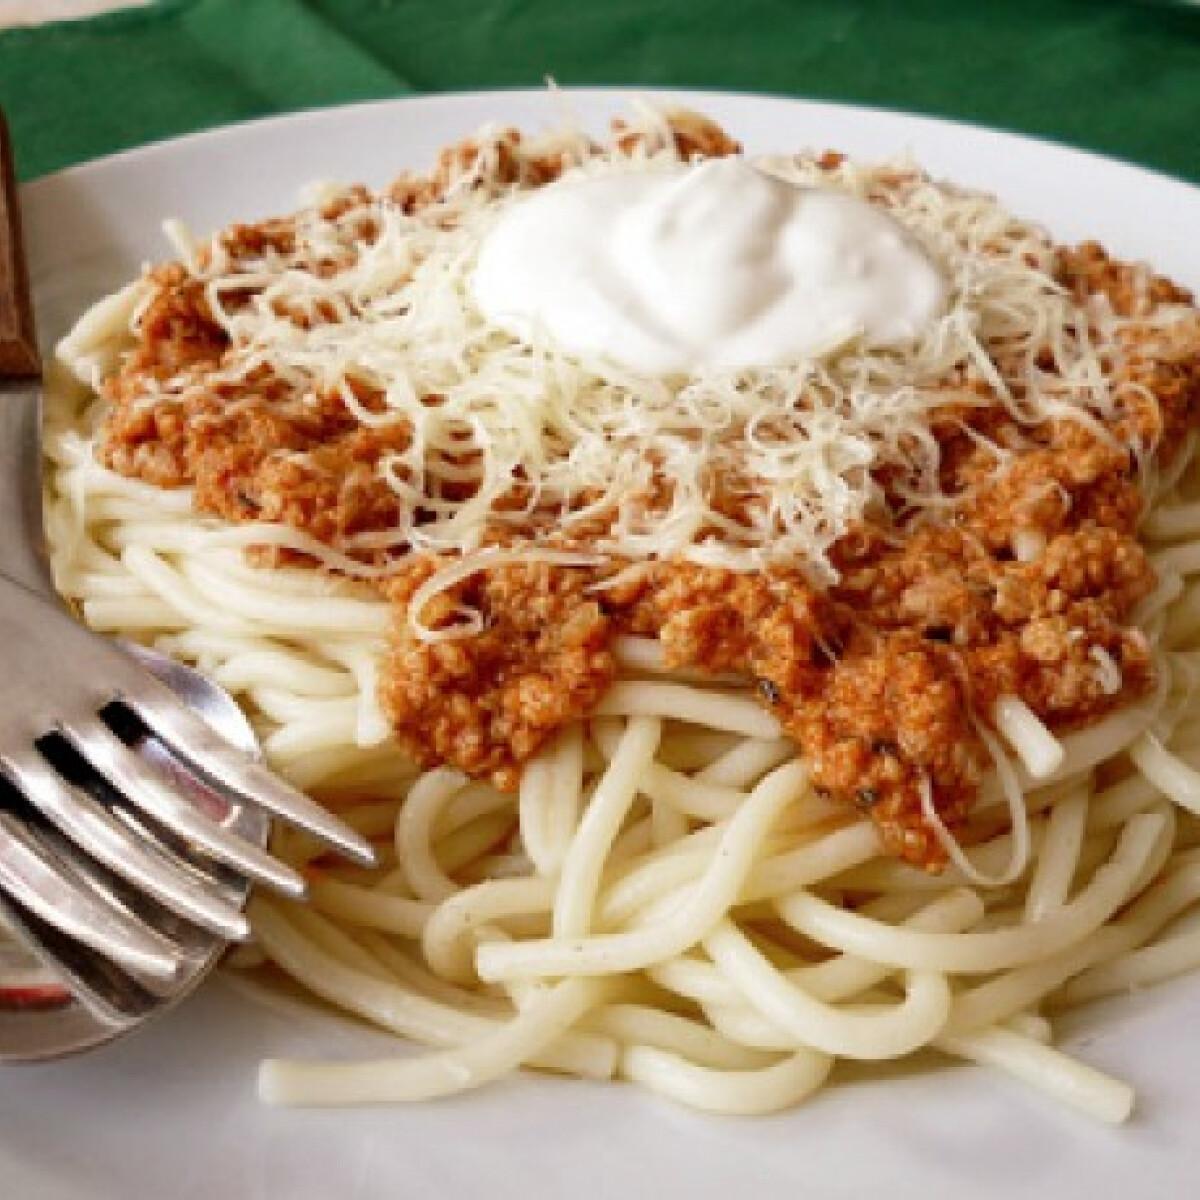 Ezen a képen: Bolognai spagetti pulykahúsból